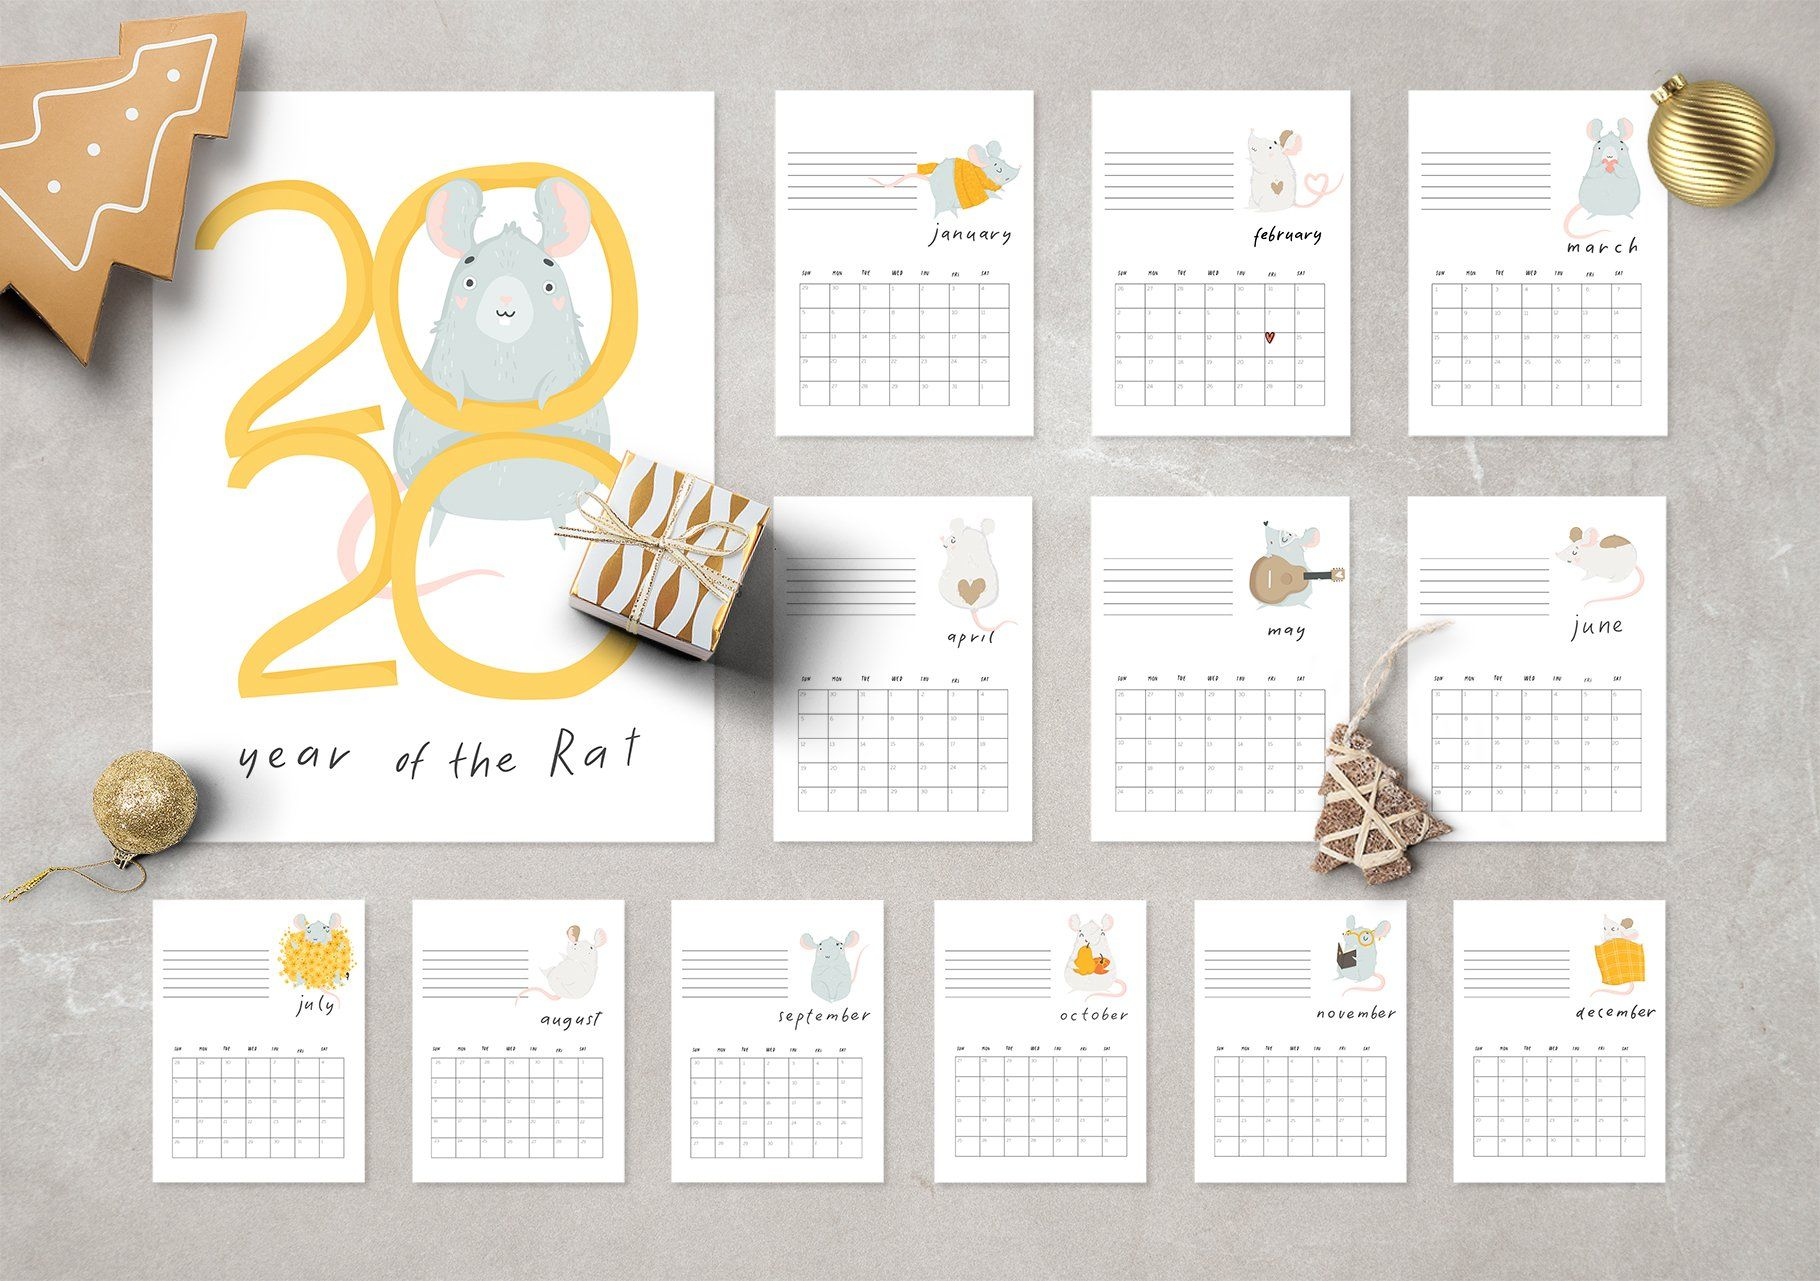 Cute Rat New Year 2020 Calendar Calendar Design Template Printable Calendar 2020 New Year 2020